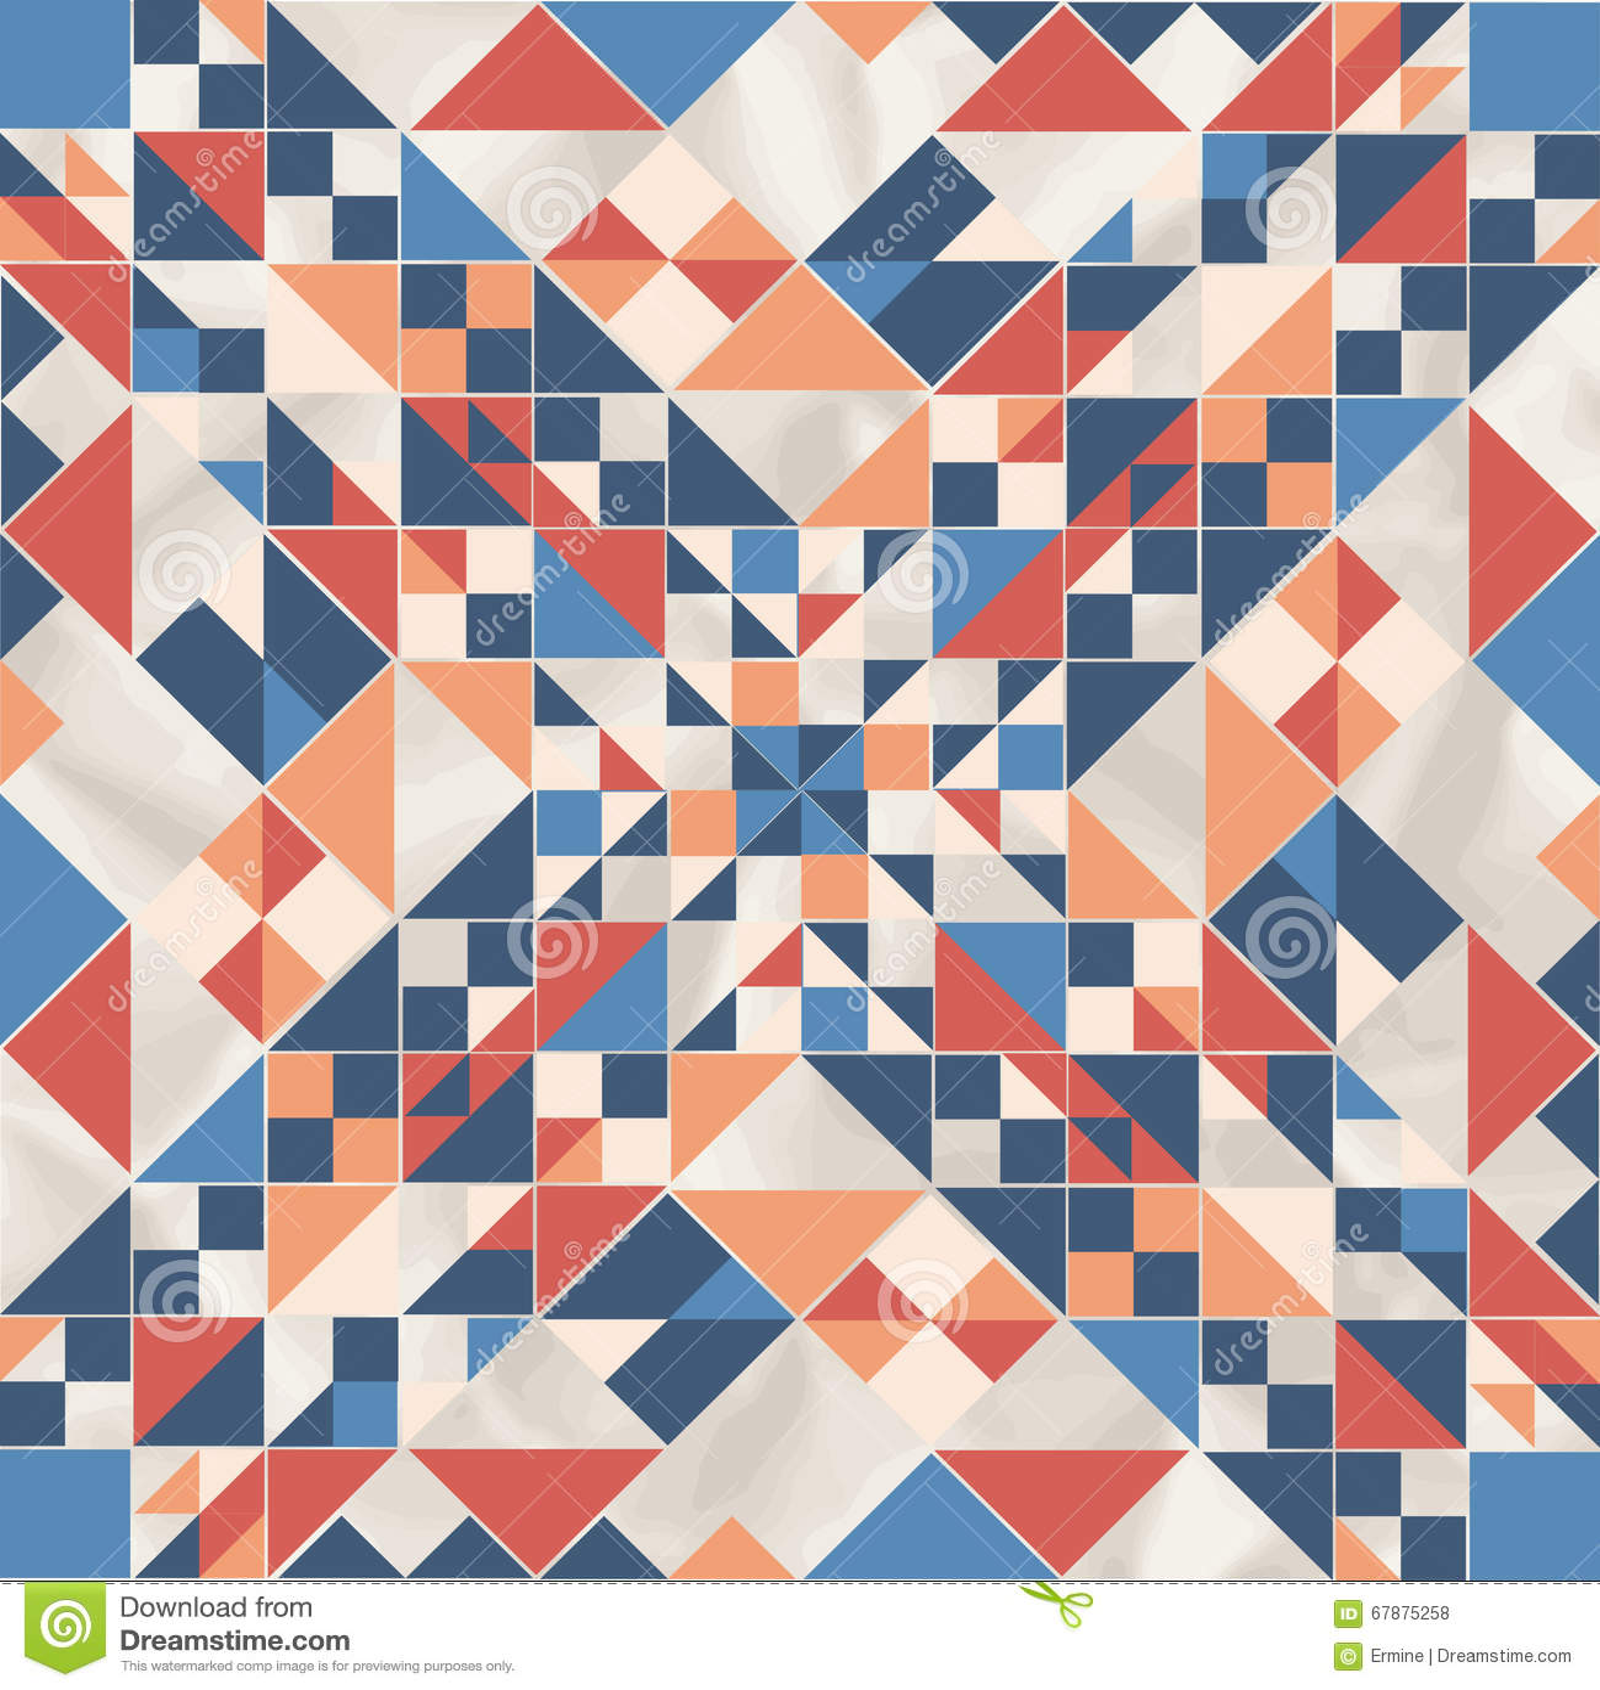 Vector o teste padrão geométrico com formas geométricas, rombo